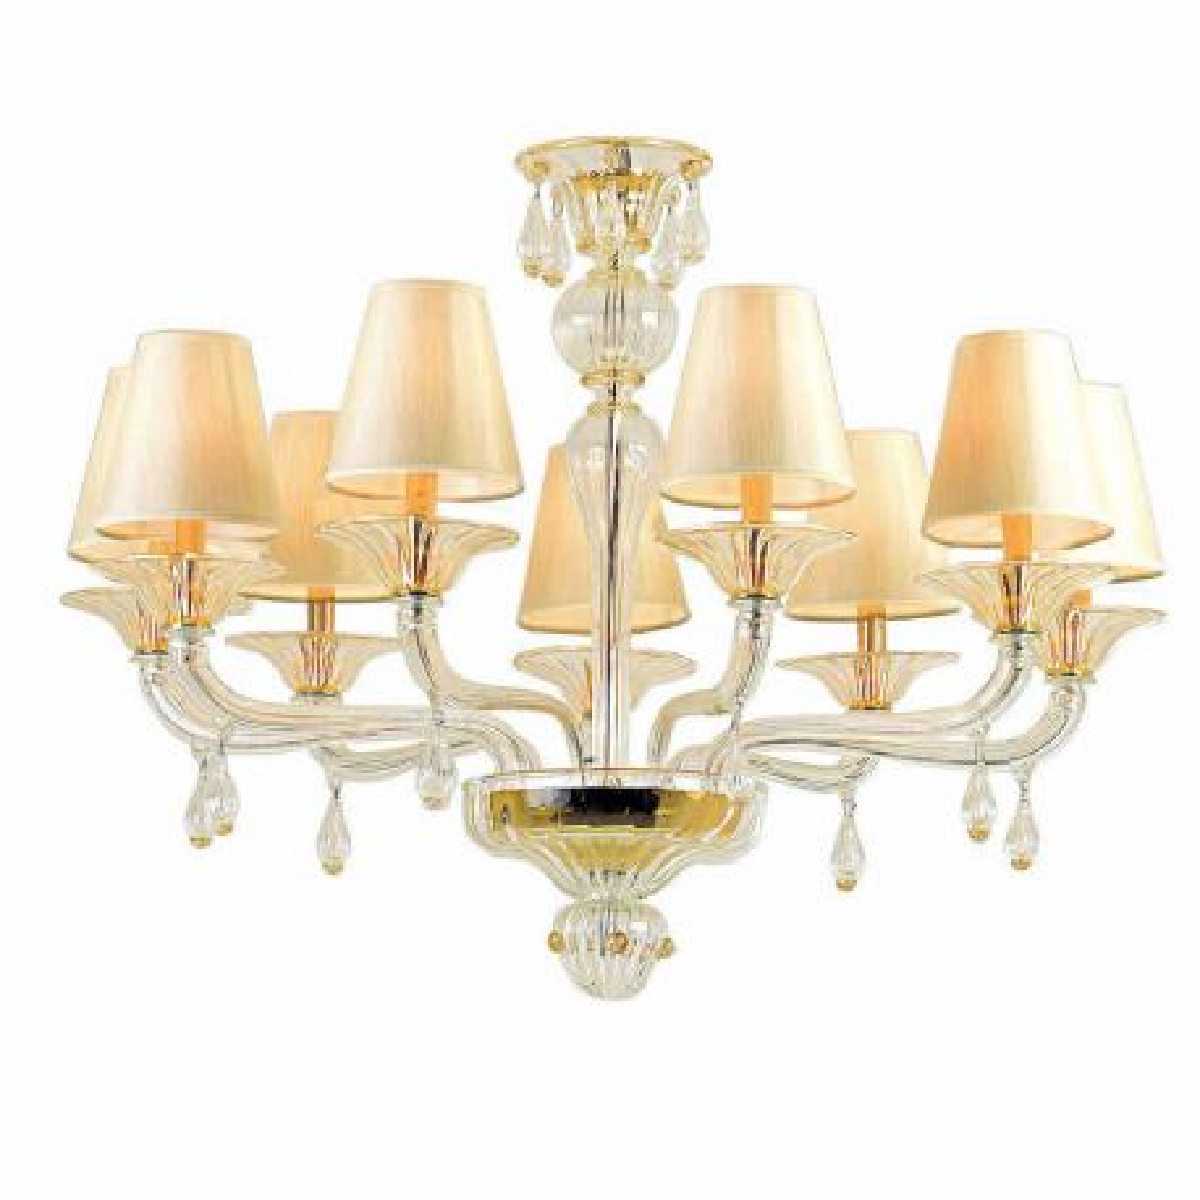 """Vernice"" lustre en cristal de Murano - 9 lights - transparent et or"